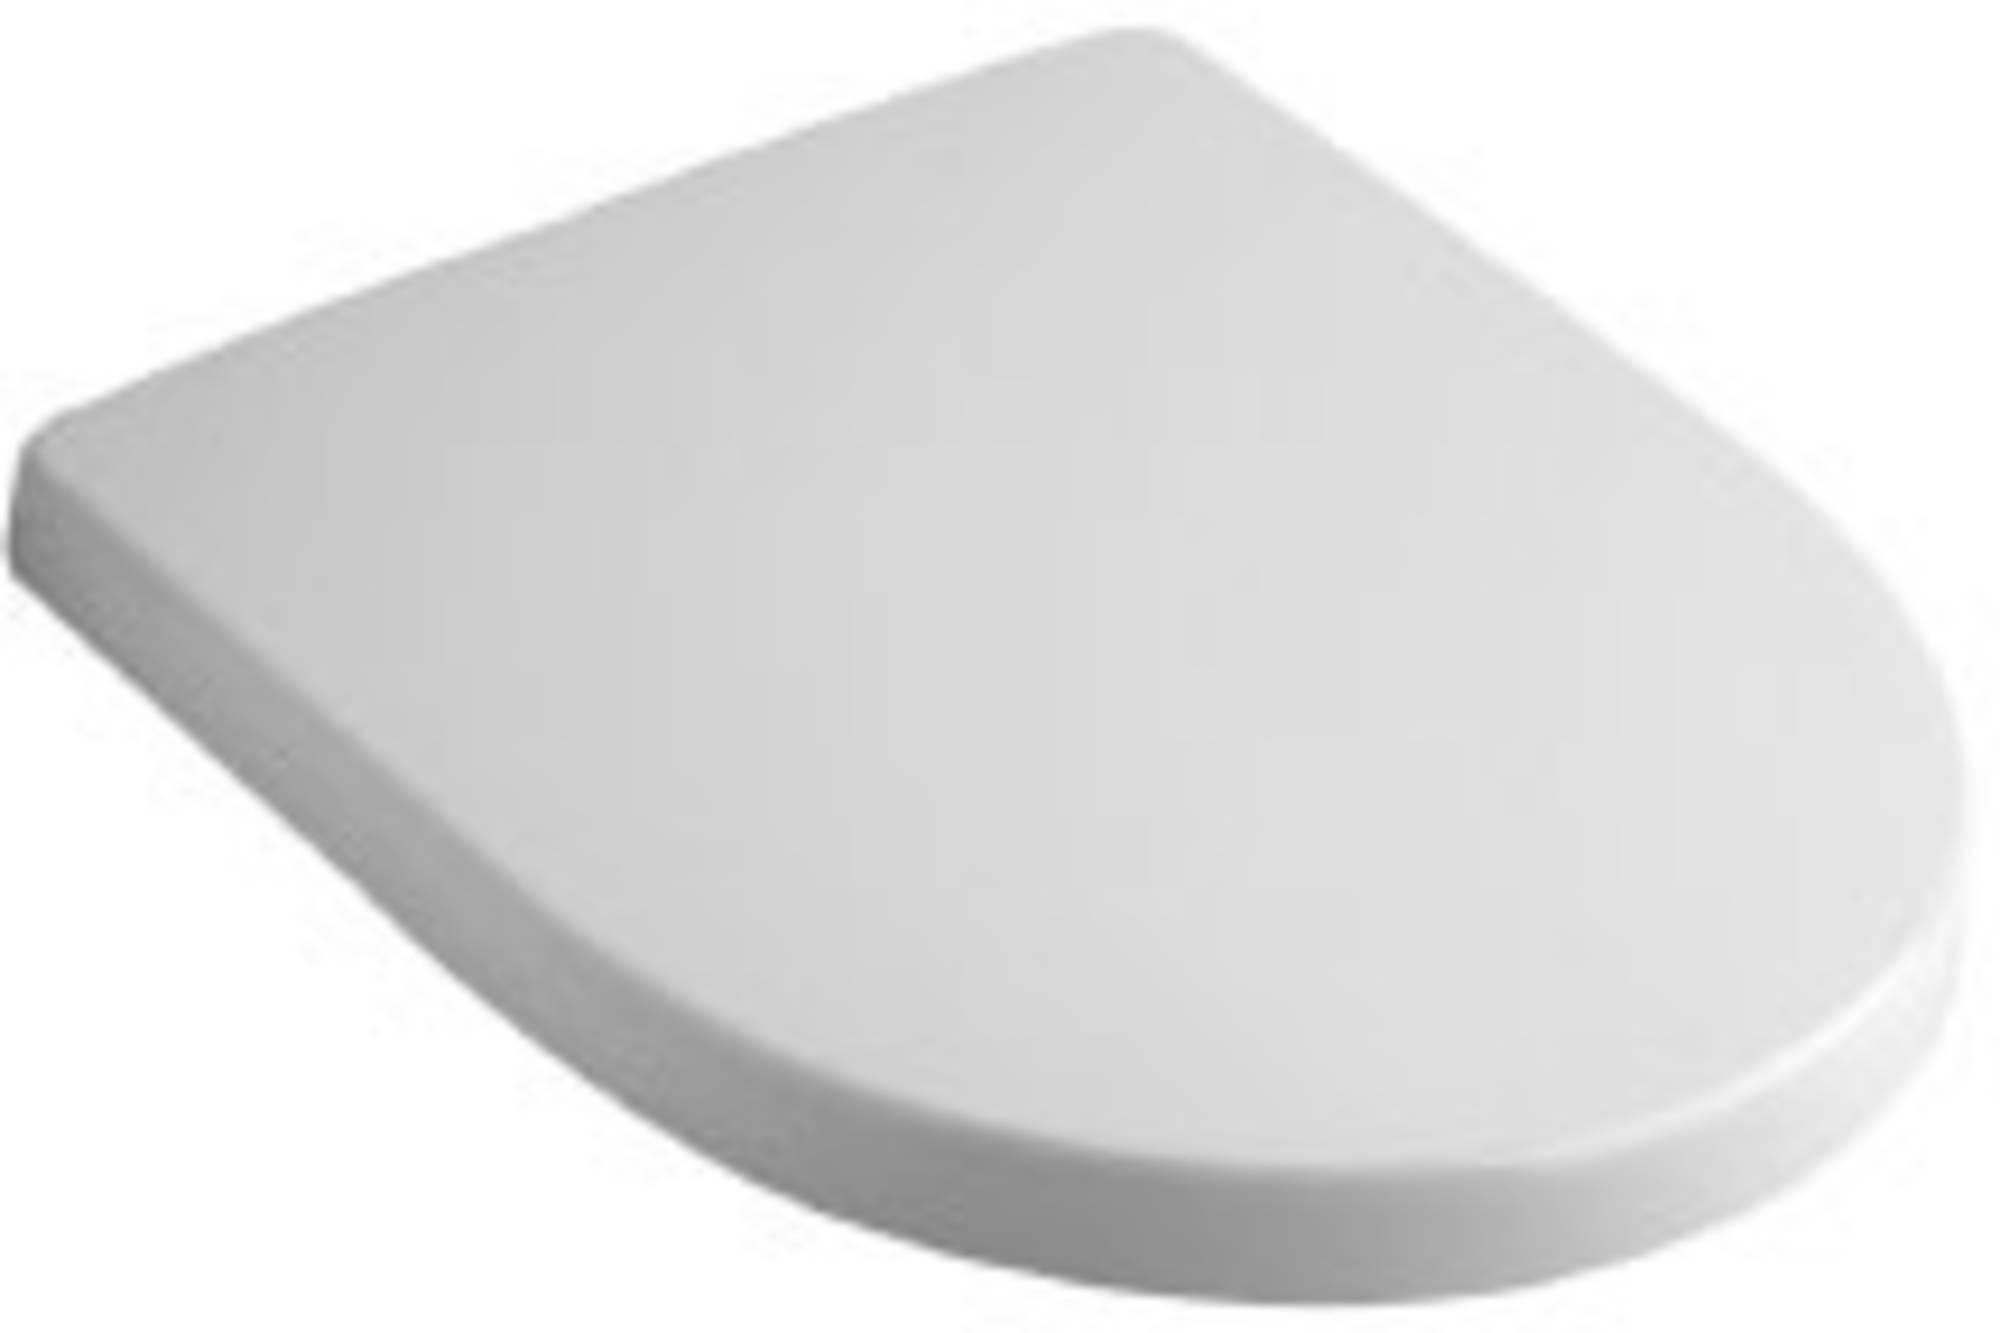 Sphinx Serie 300 basic topfix closetzitting met deksel, wit